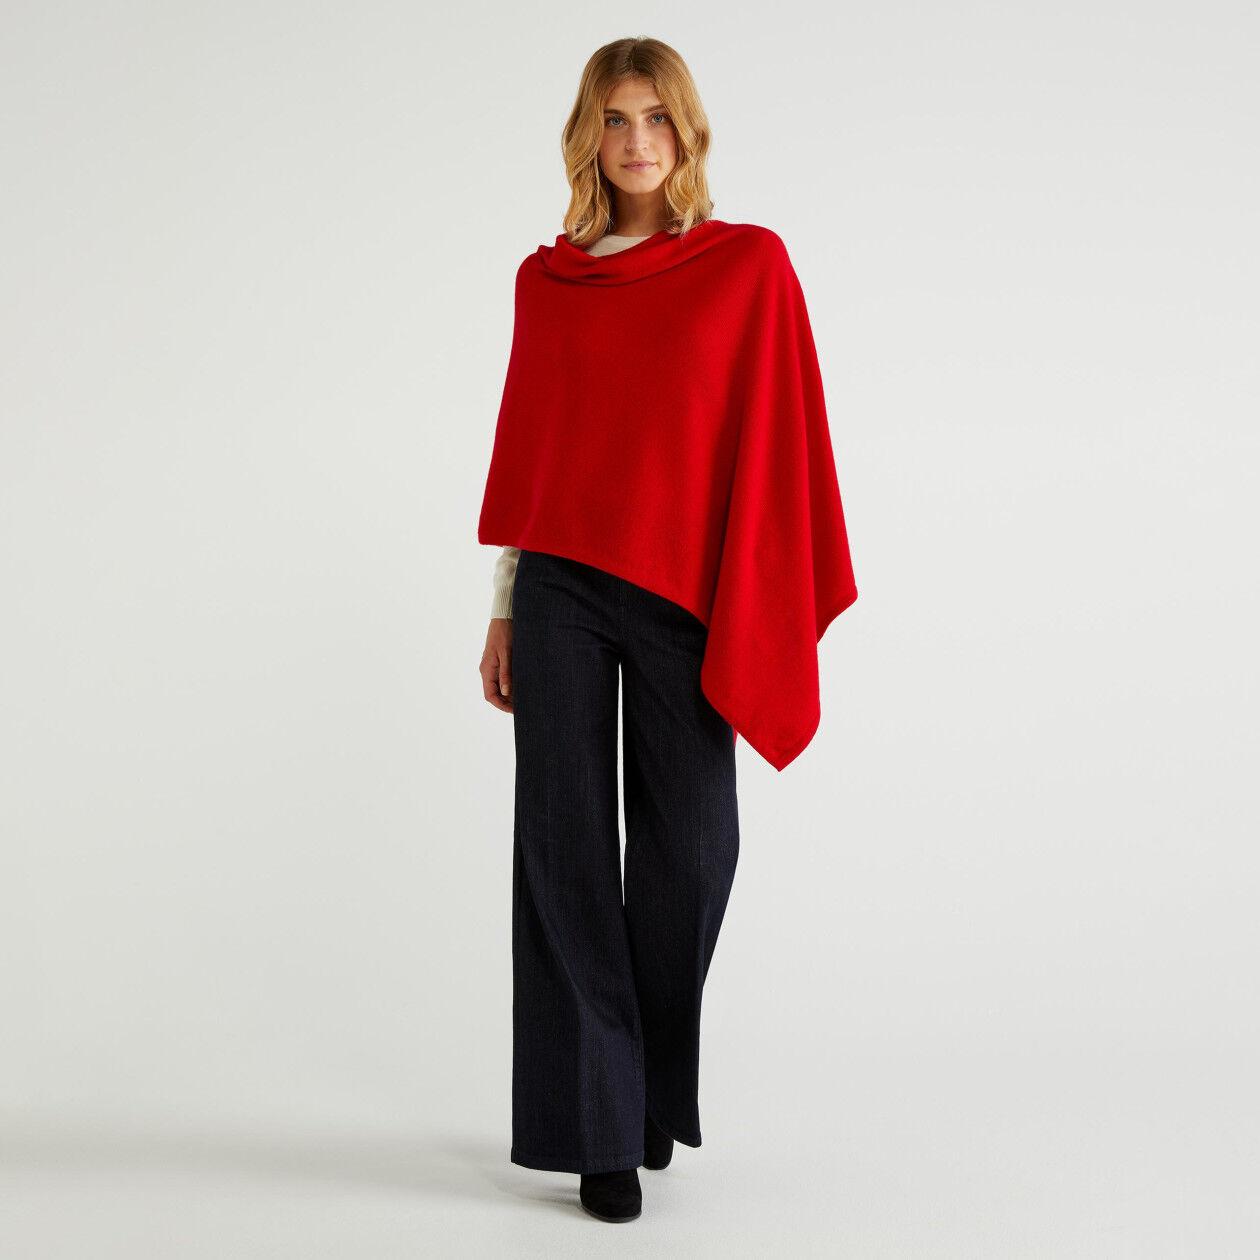 Stockinette stitch cape